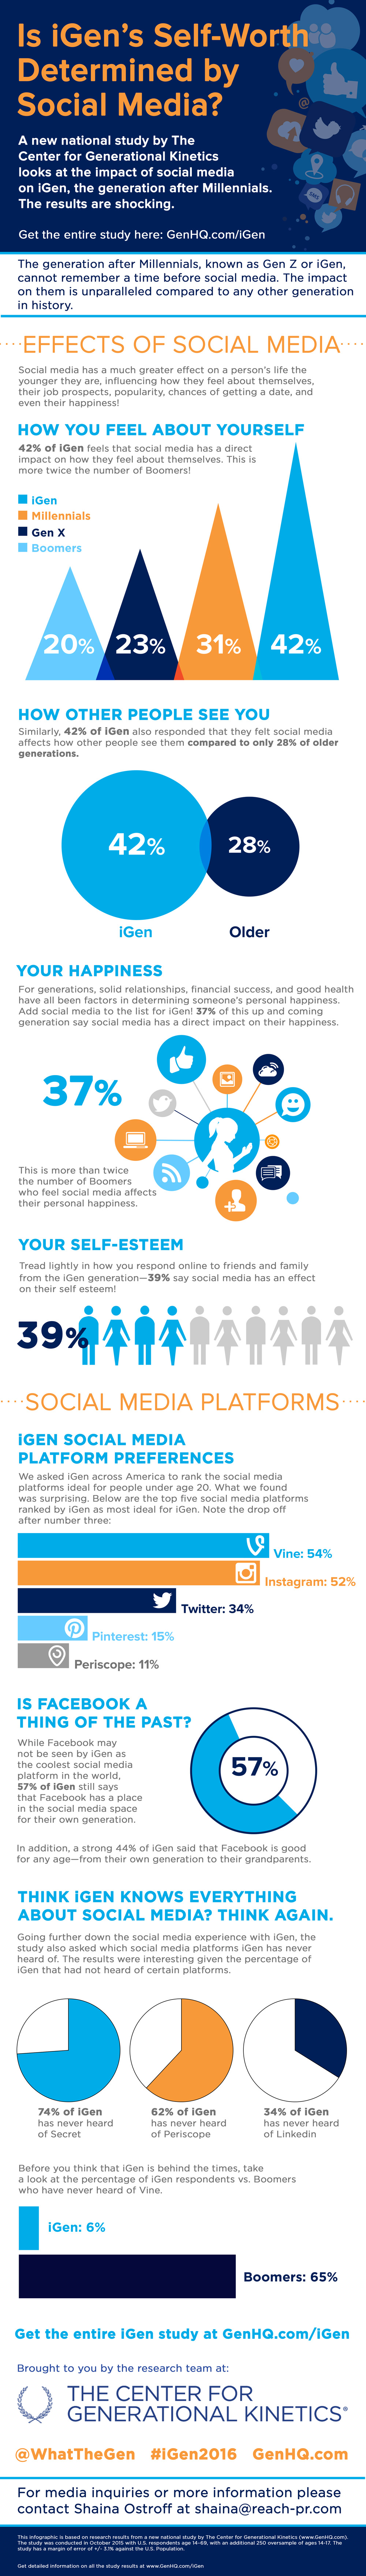 iGen_Social_Media-infographic-FINAL